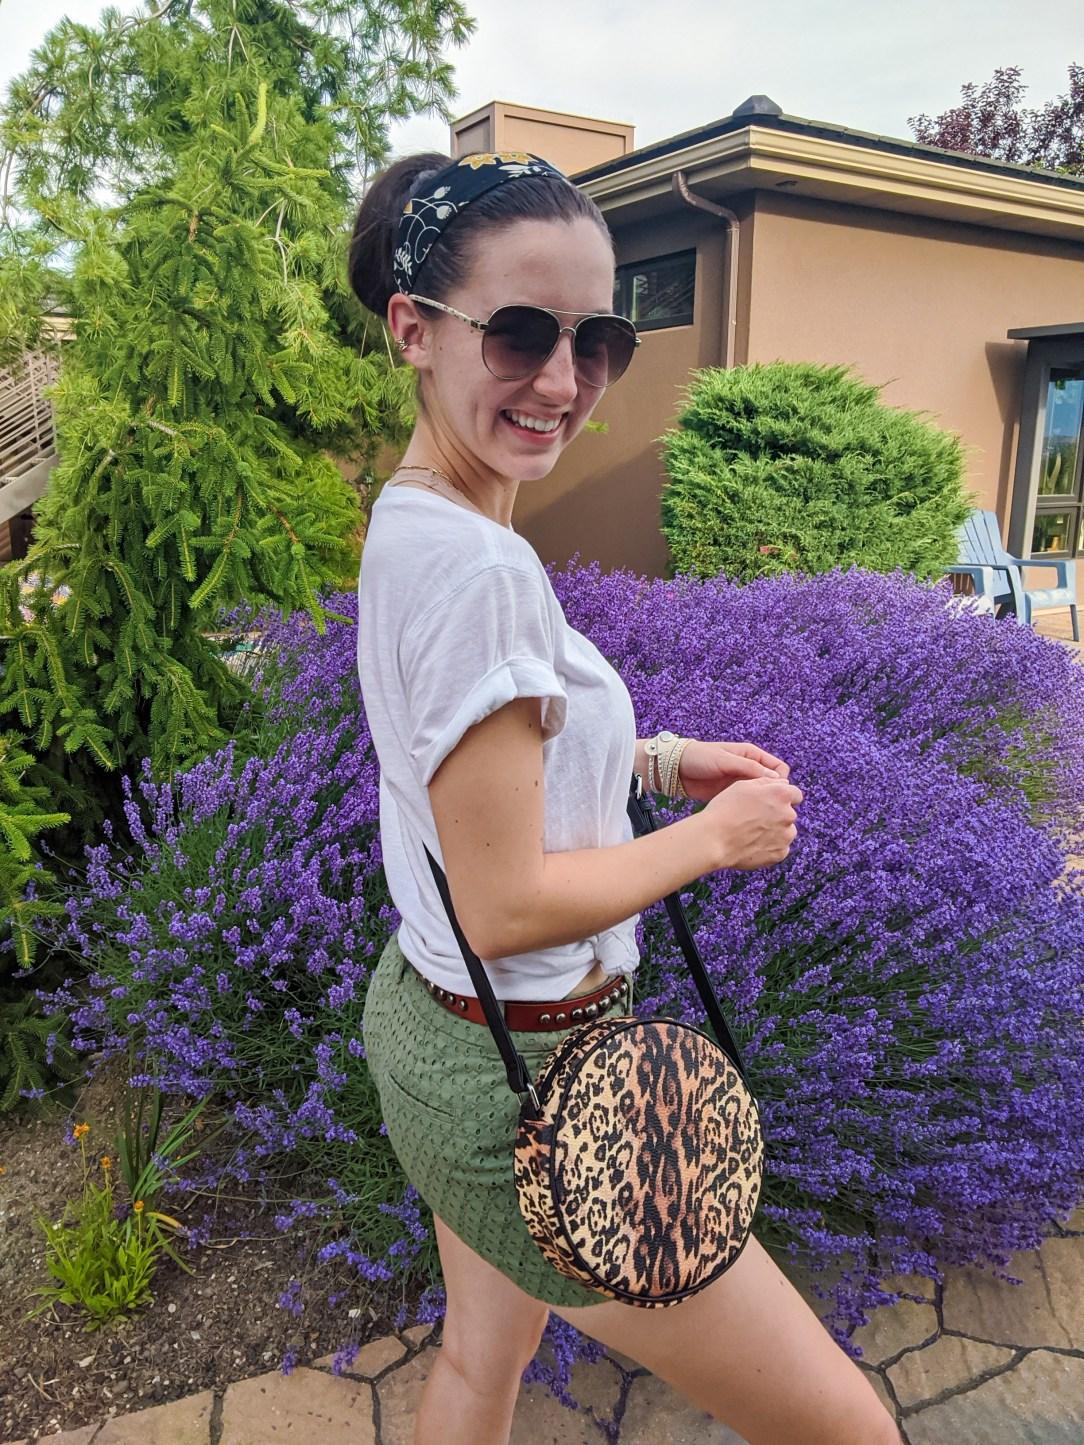 shorts-shopping-headband-leopard-circle-purse